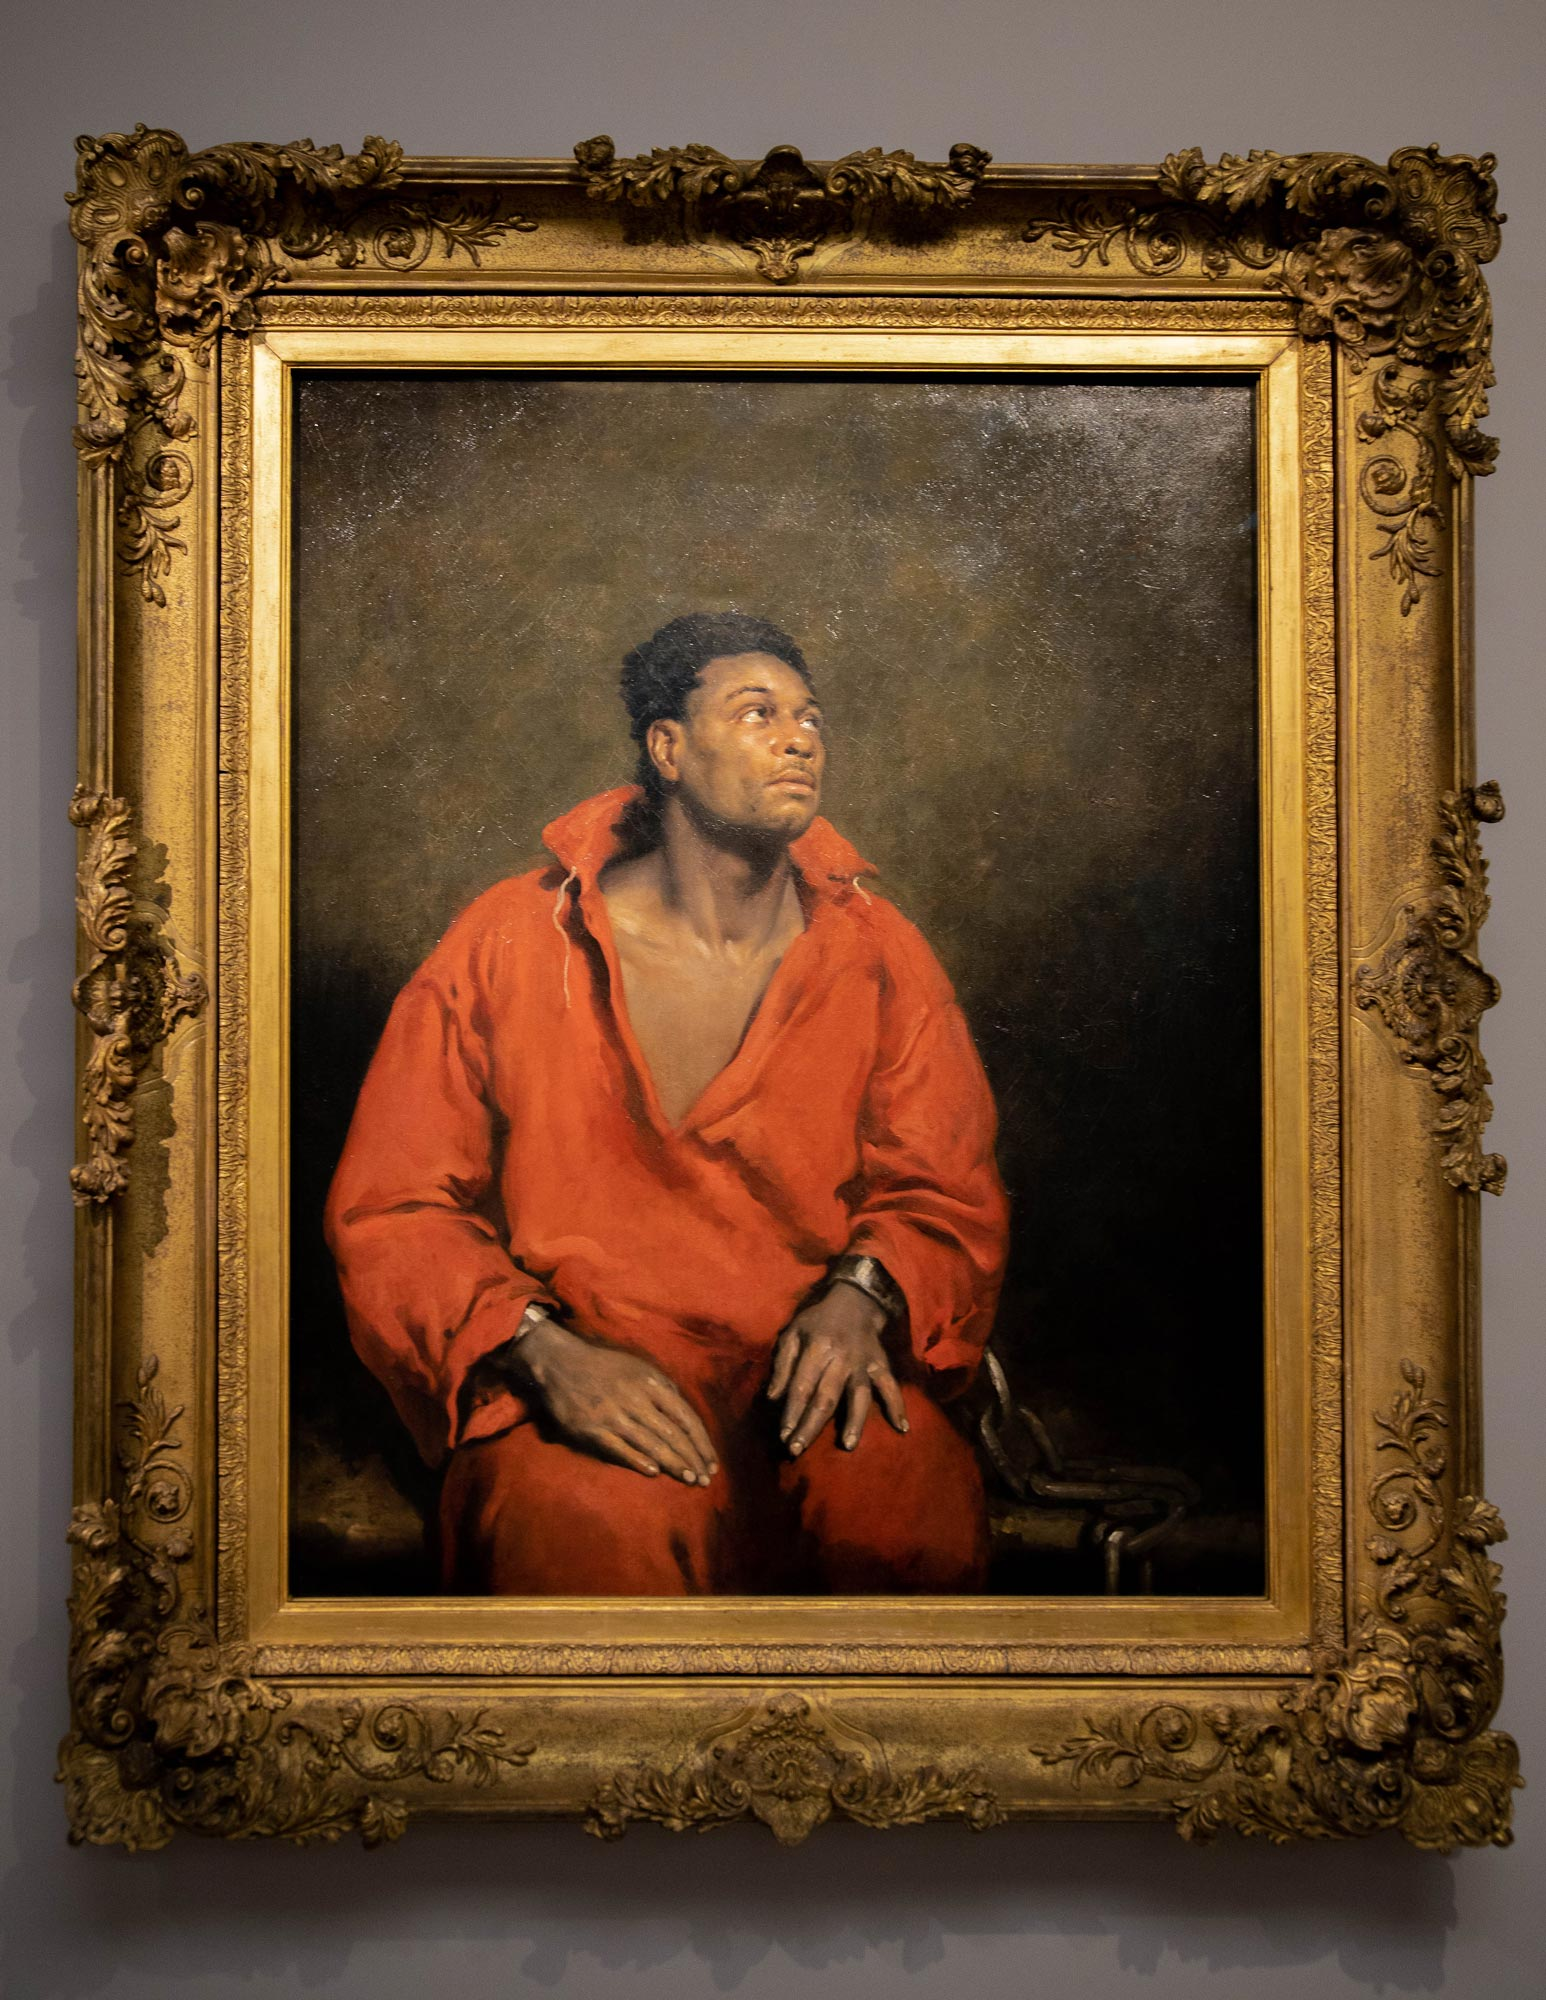 orsay_the-captive-slave_john-philip simpson.jpg